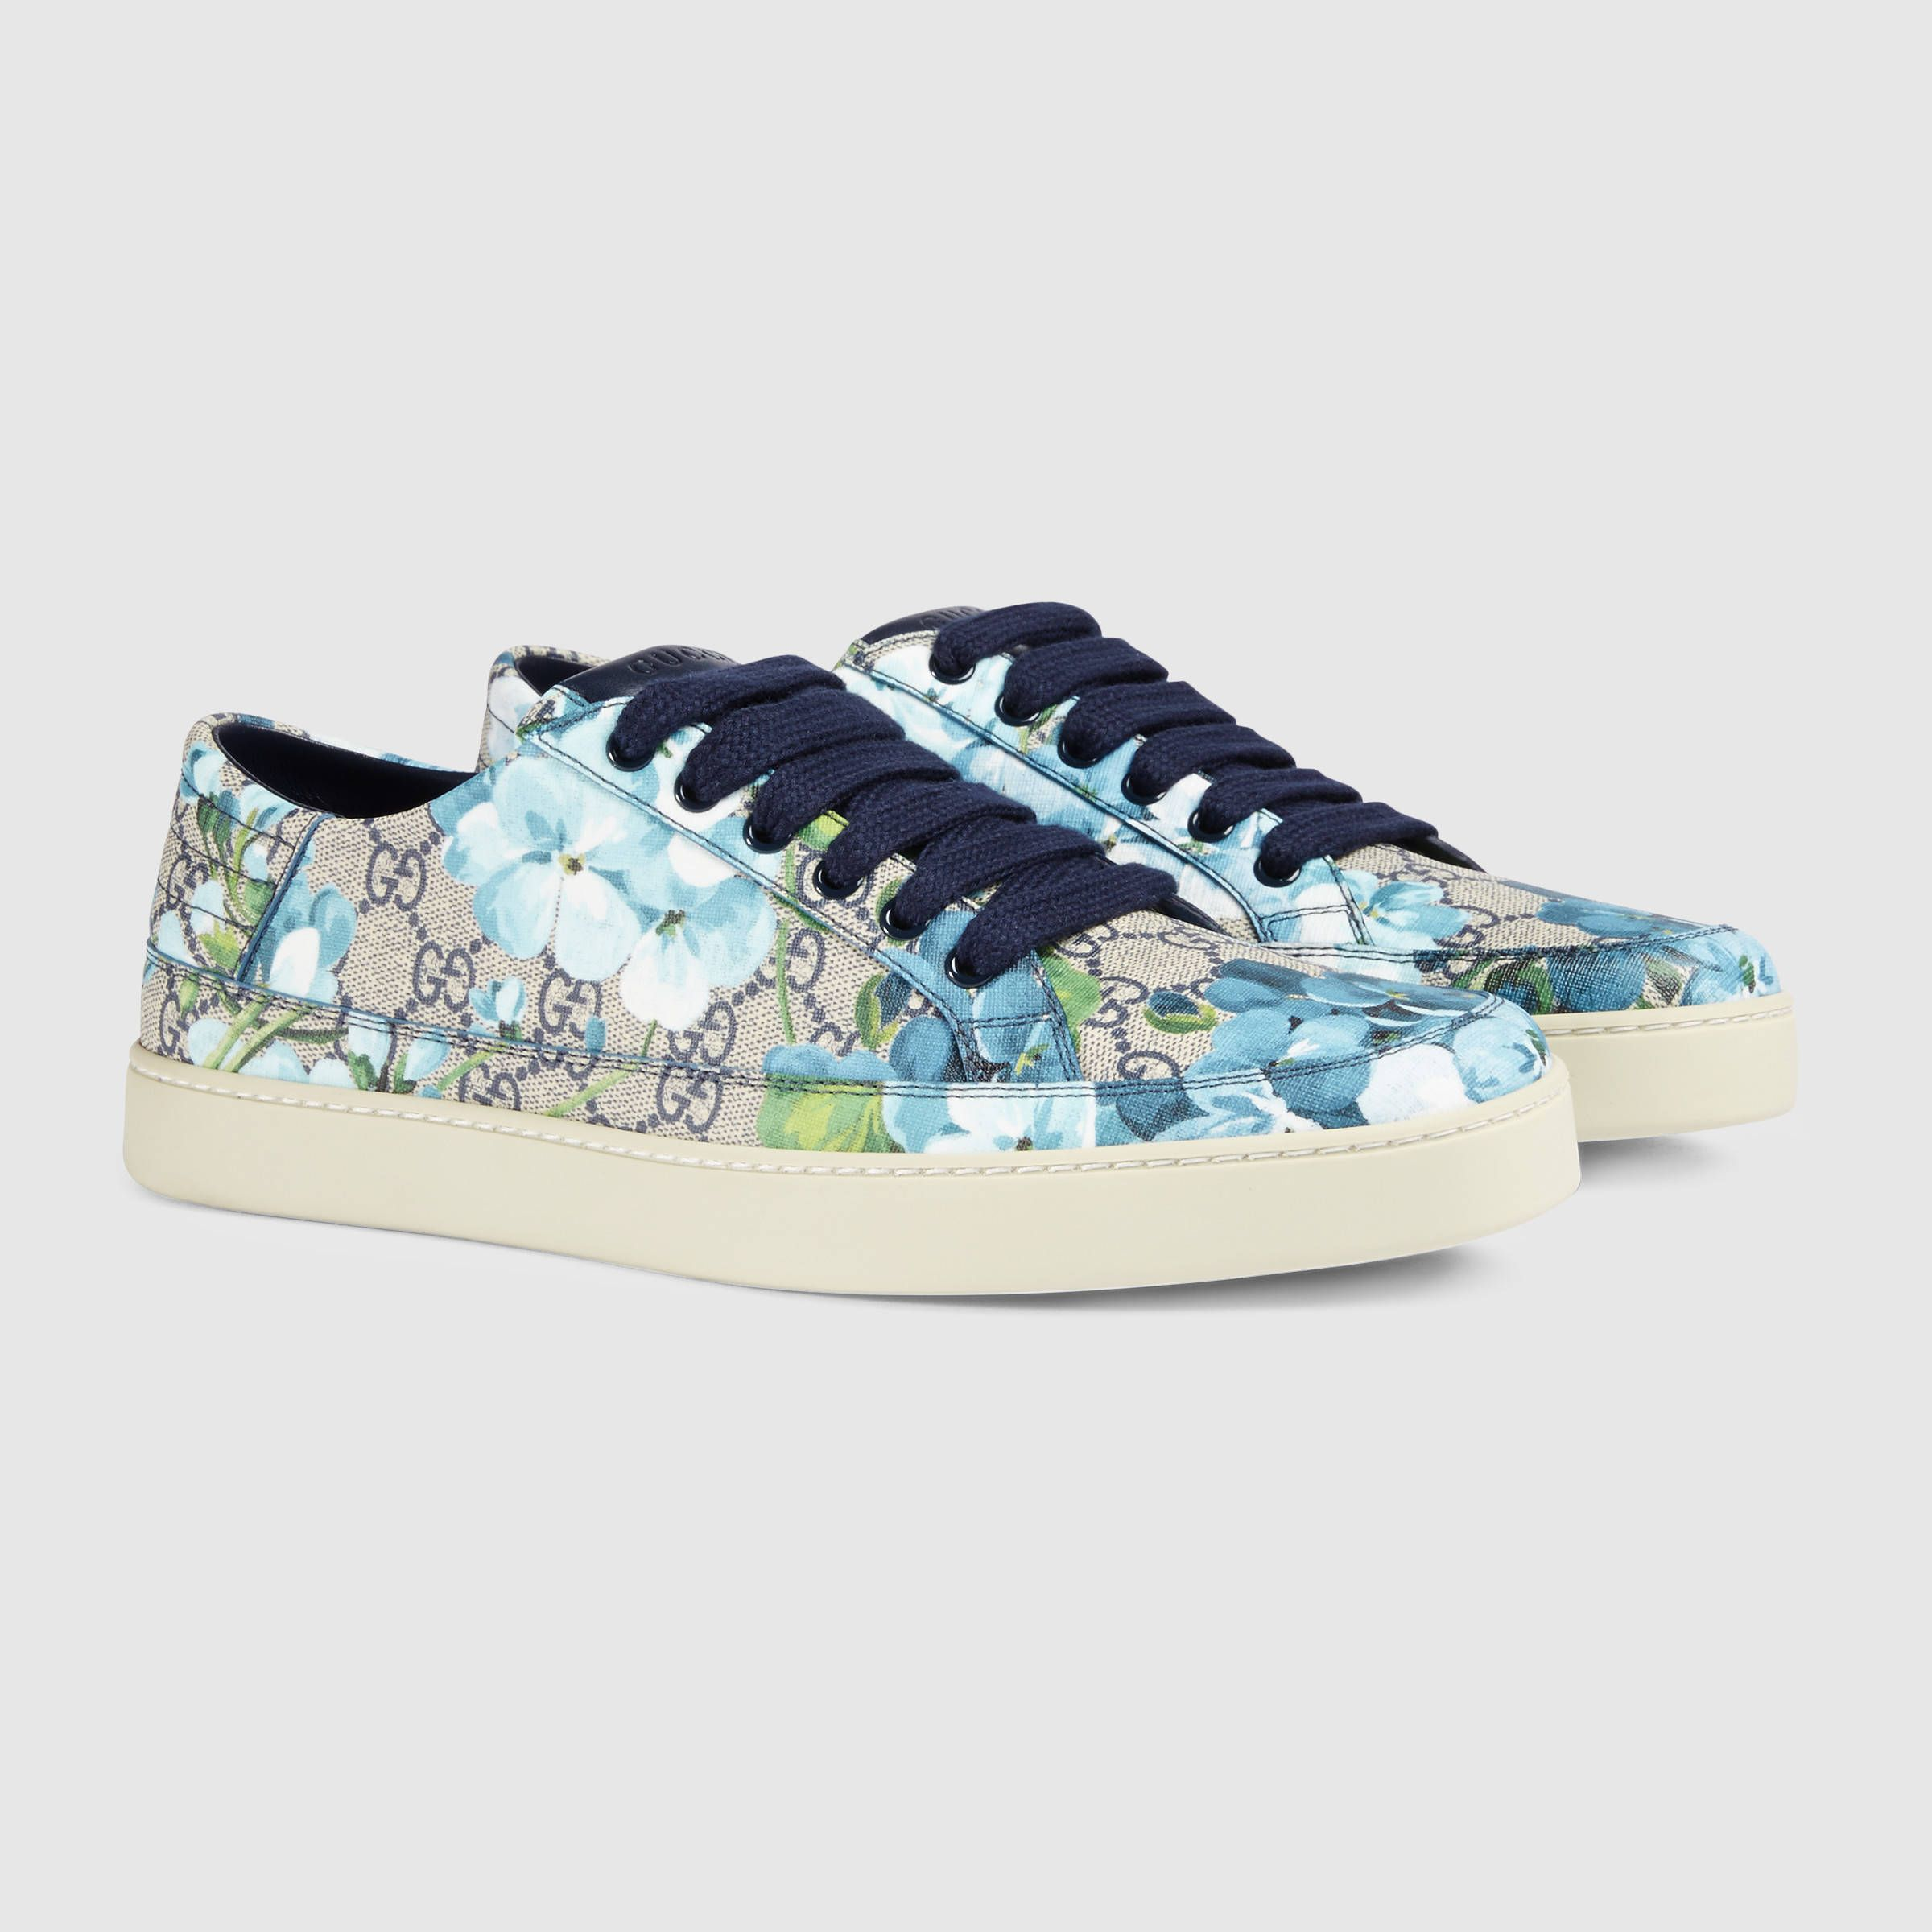 GG Blooms low-top sneaker